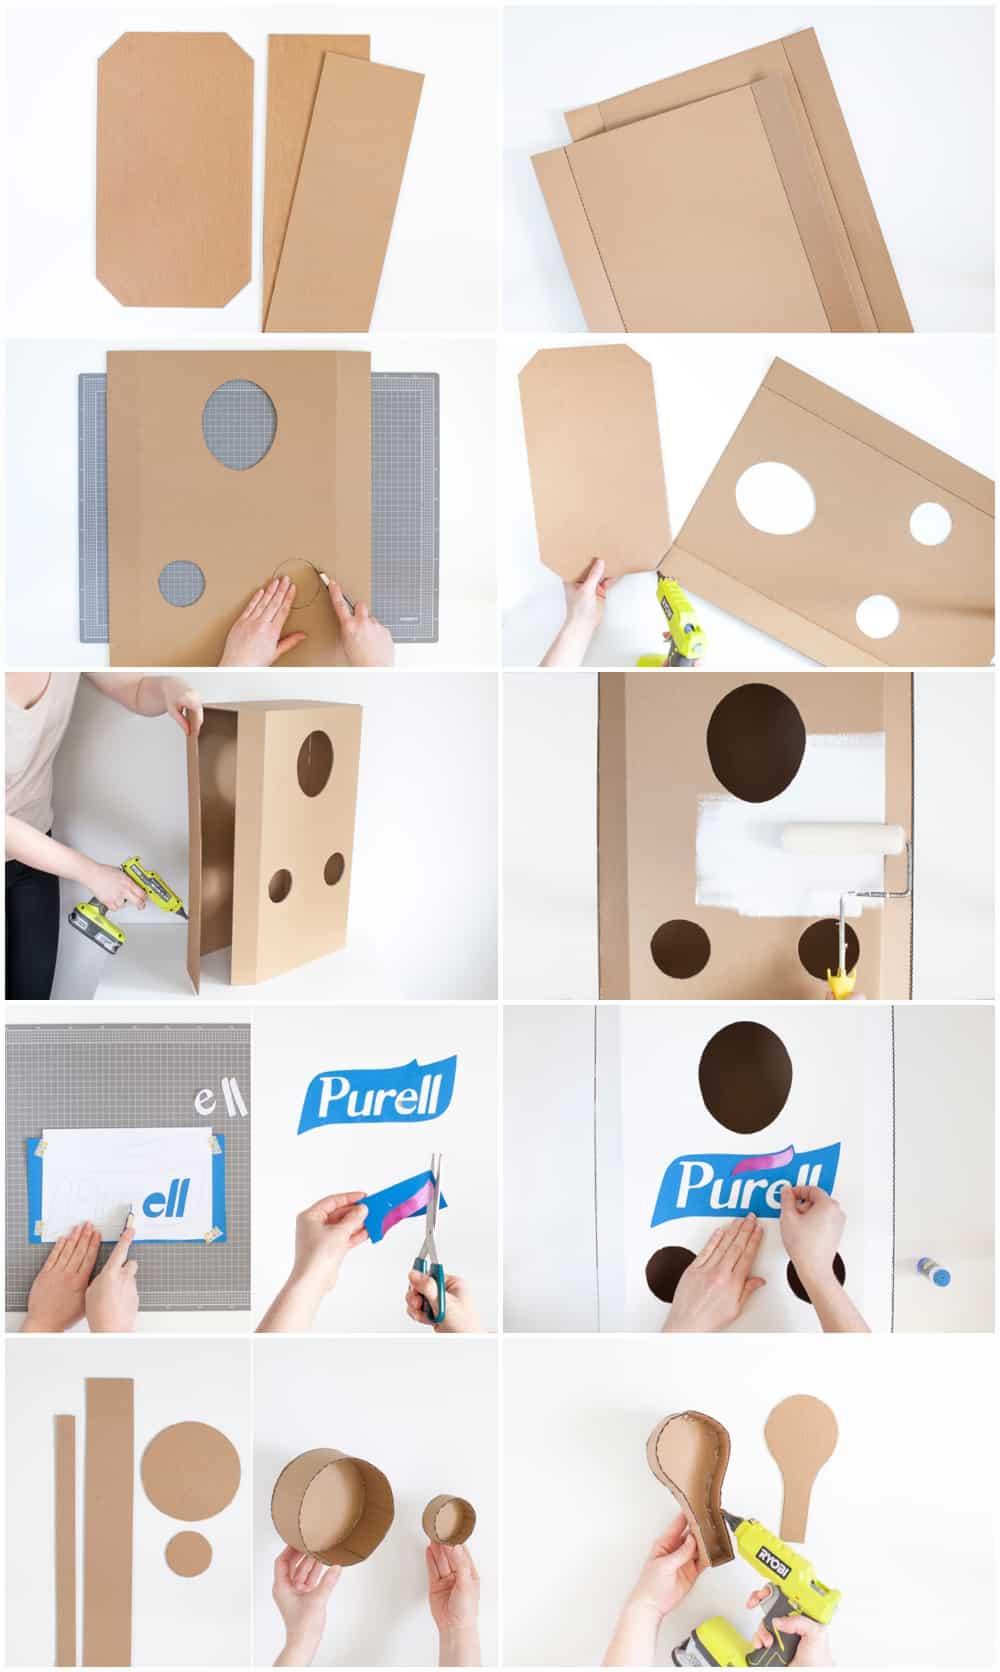 cardboard hand sanitizer Halloween costume